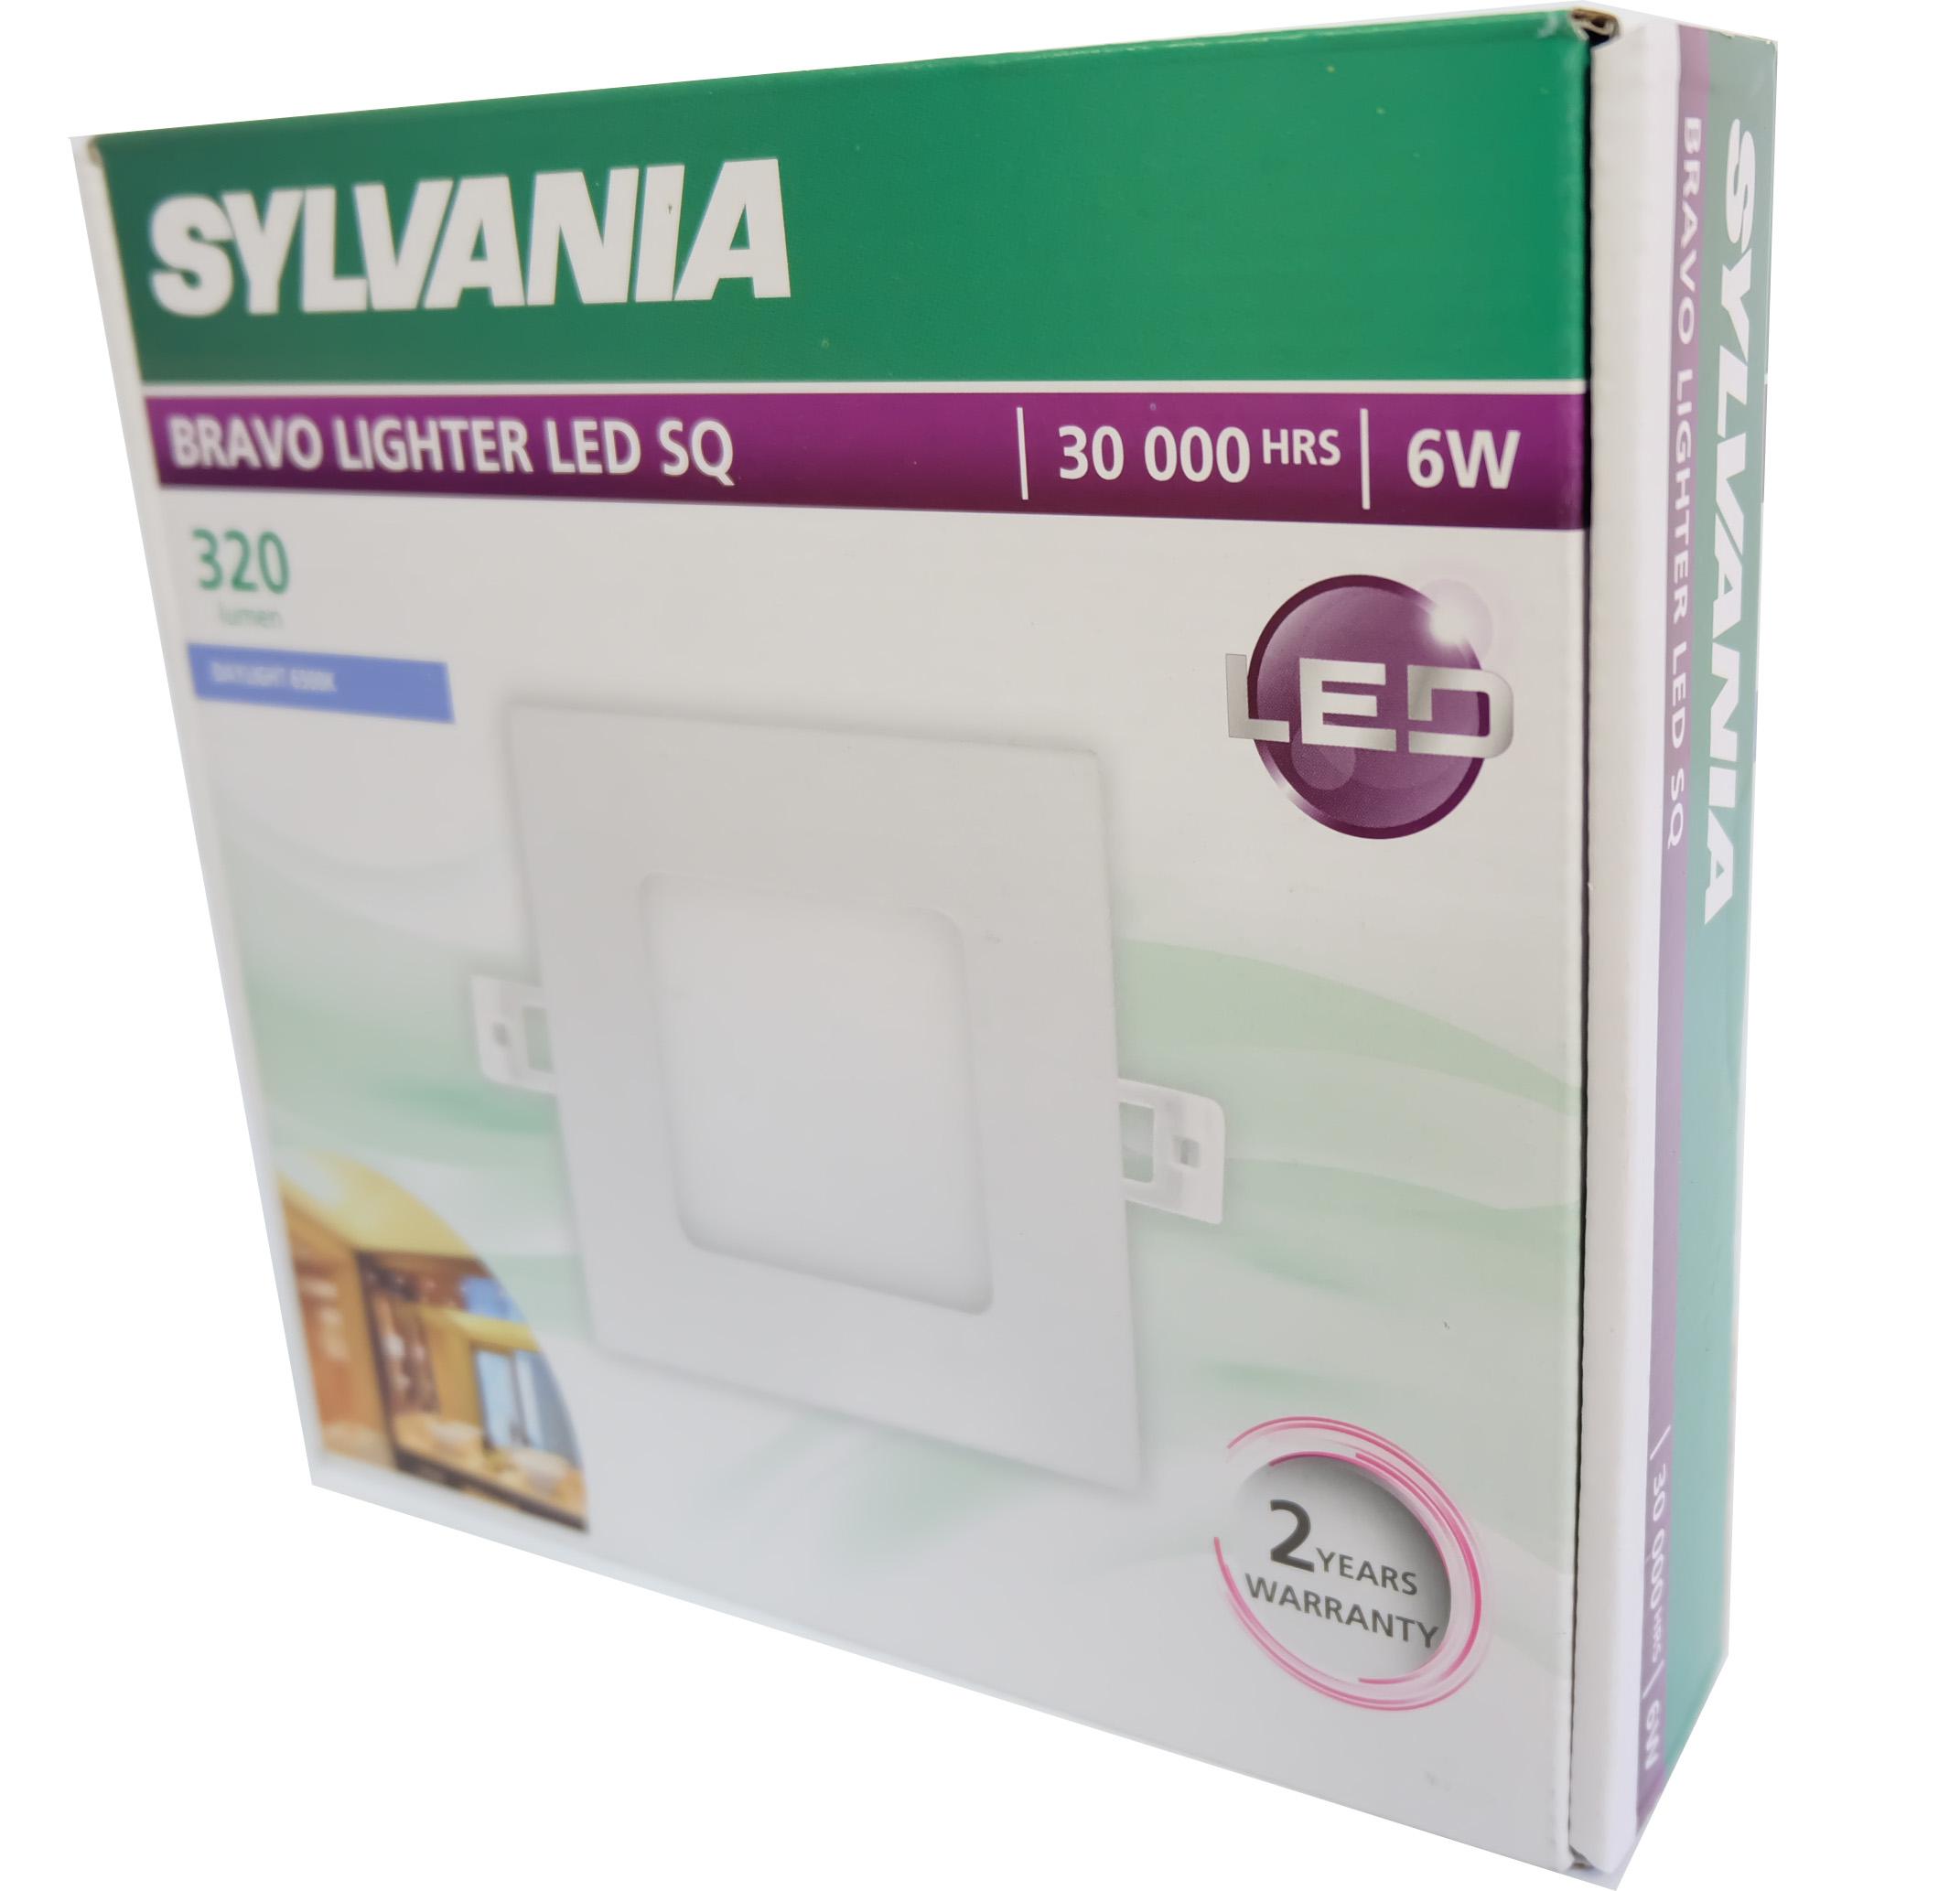 SYLVANIA  ดาวน์ไลท์ BRAVO LIGHTER LED SQ 6W  _6 วัตต์ (แสงเดย์ไลท์)